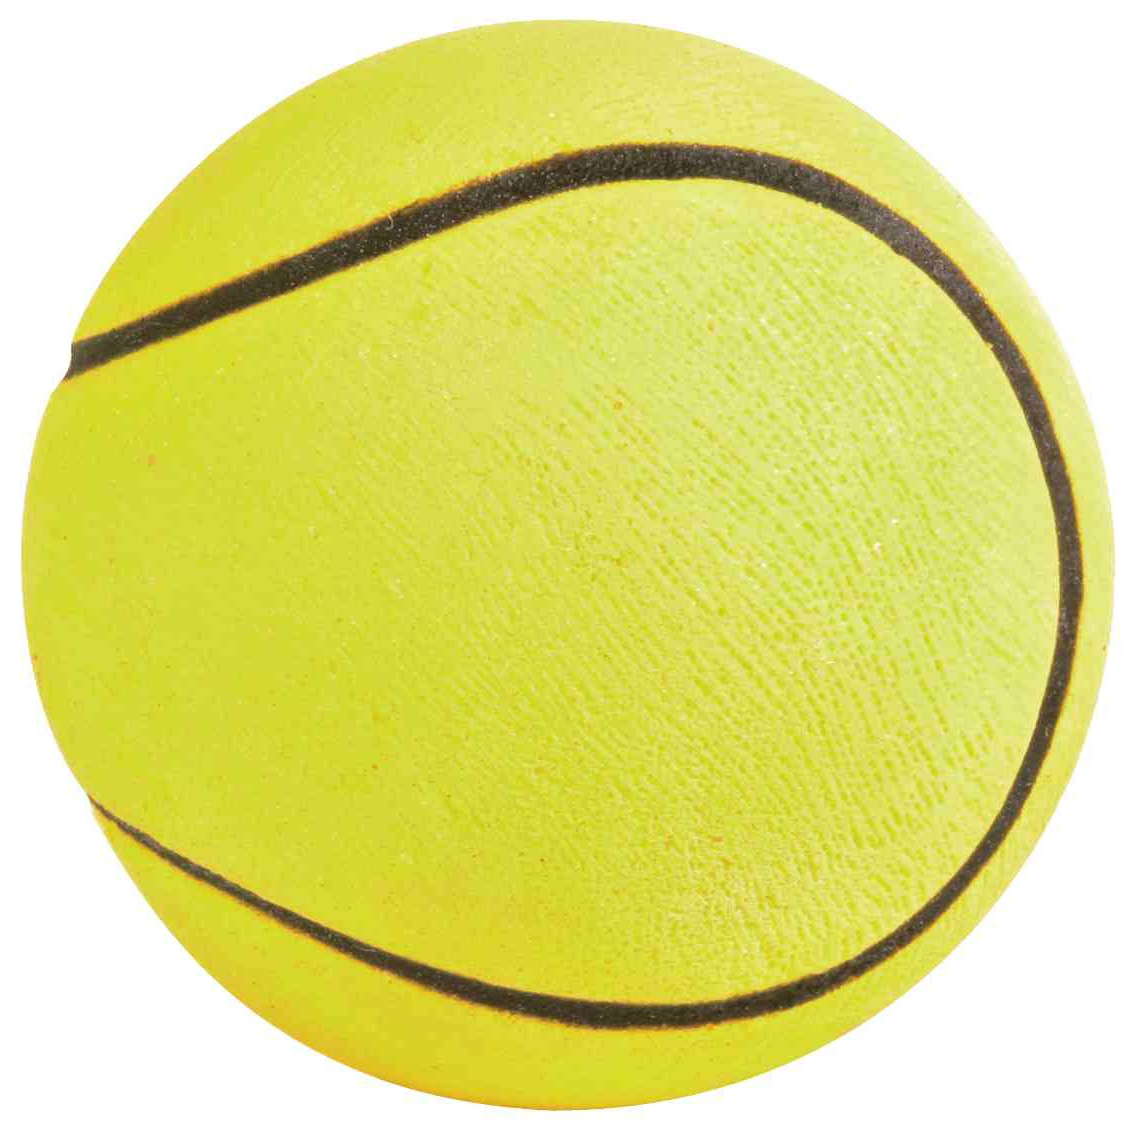 TRIXIE Hundeball Spielball aus Moosgummi 6 cm 3443, Bild 3